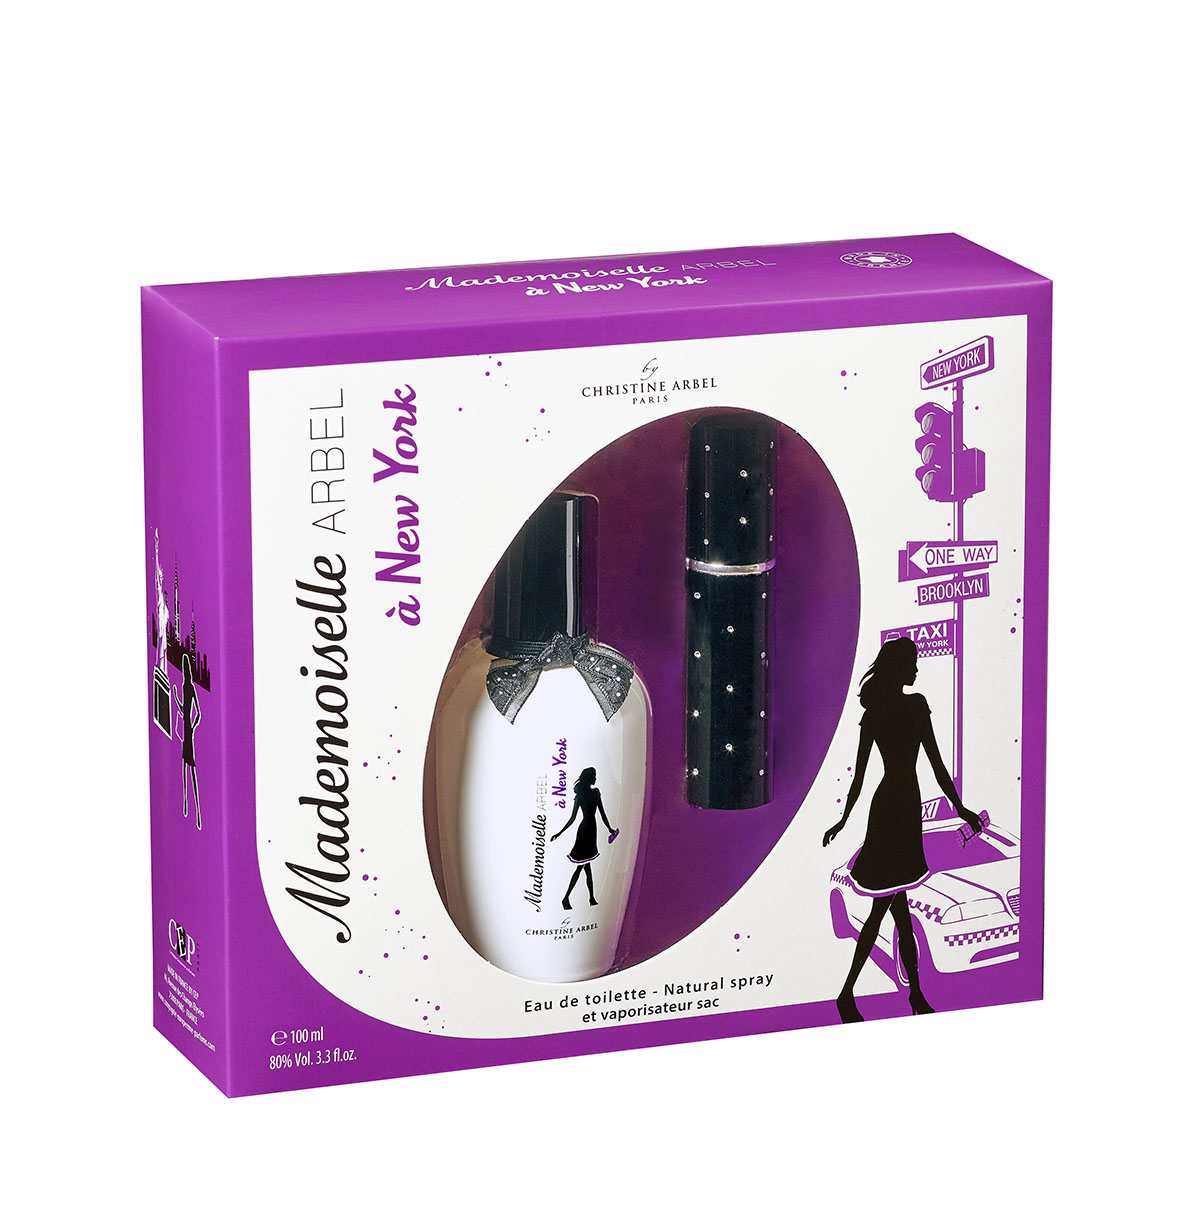 Coffret cadeau parfum femme Mademoiselle Arbel à New York